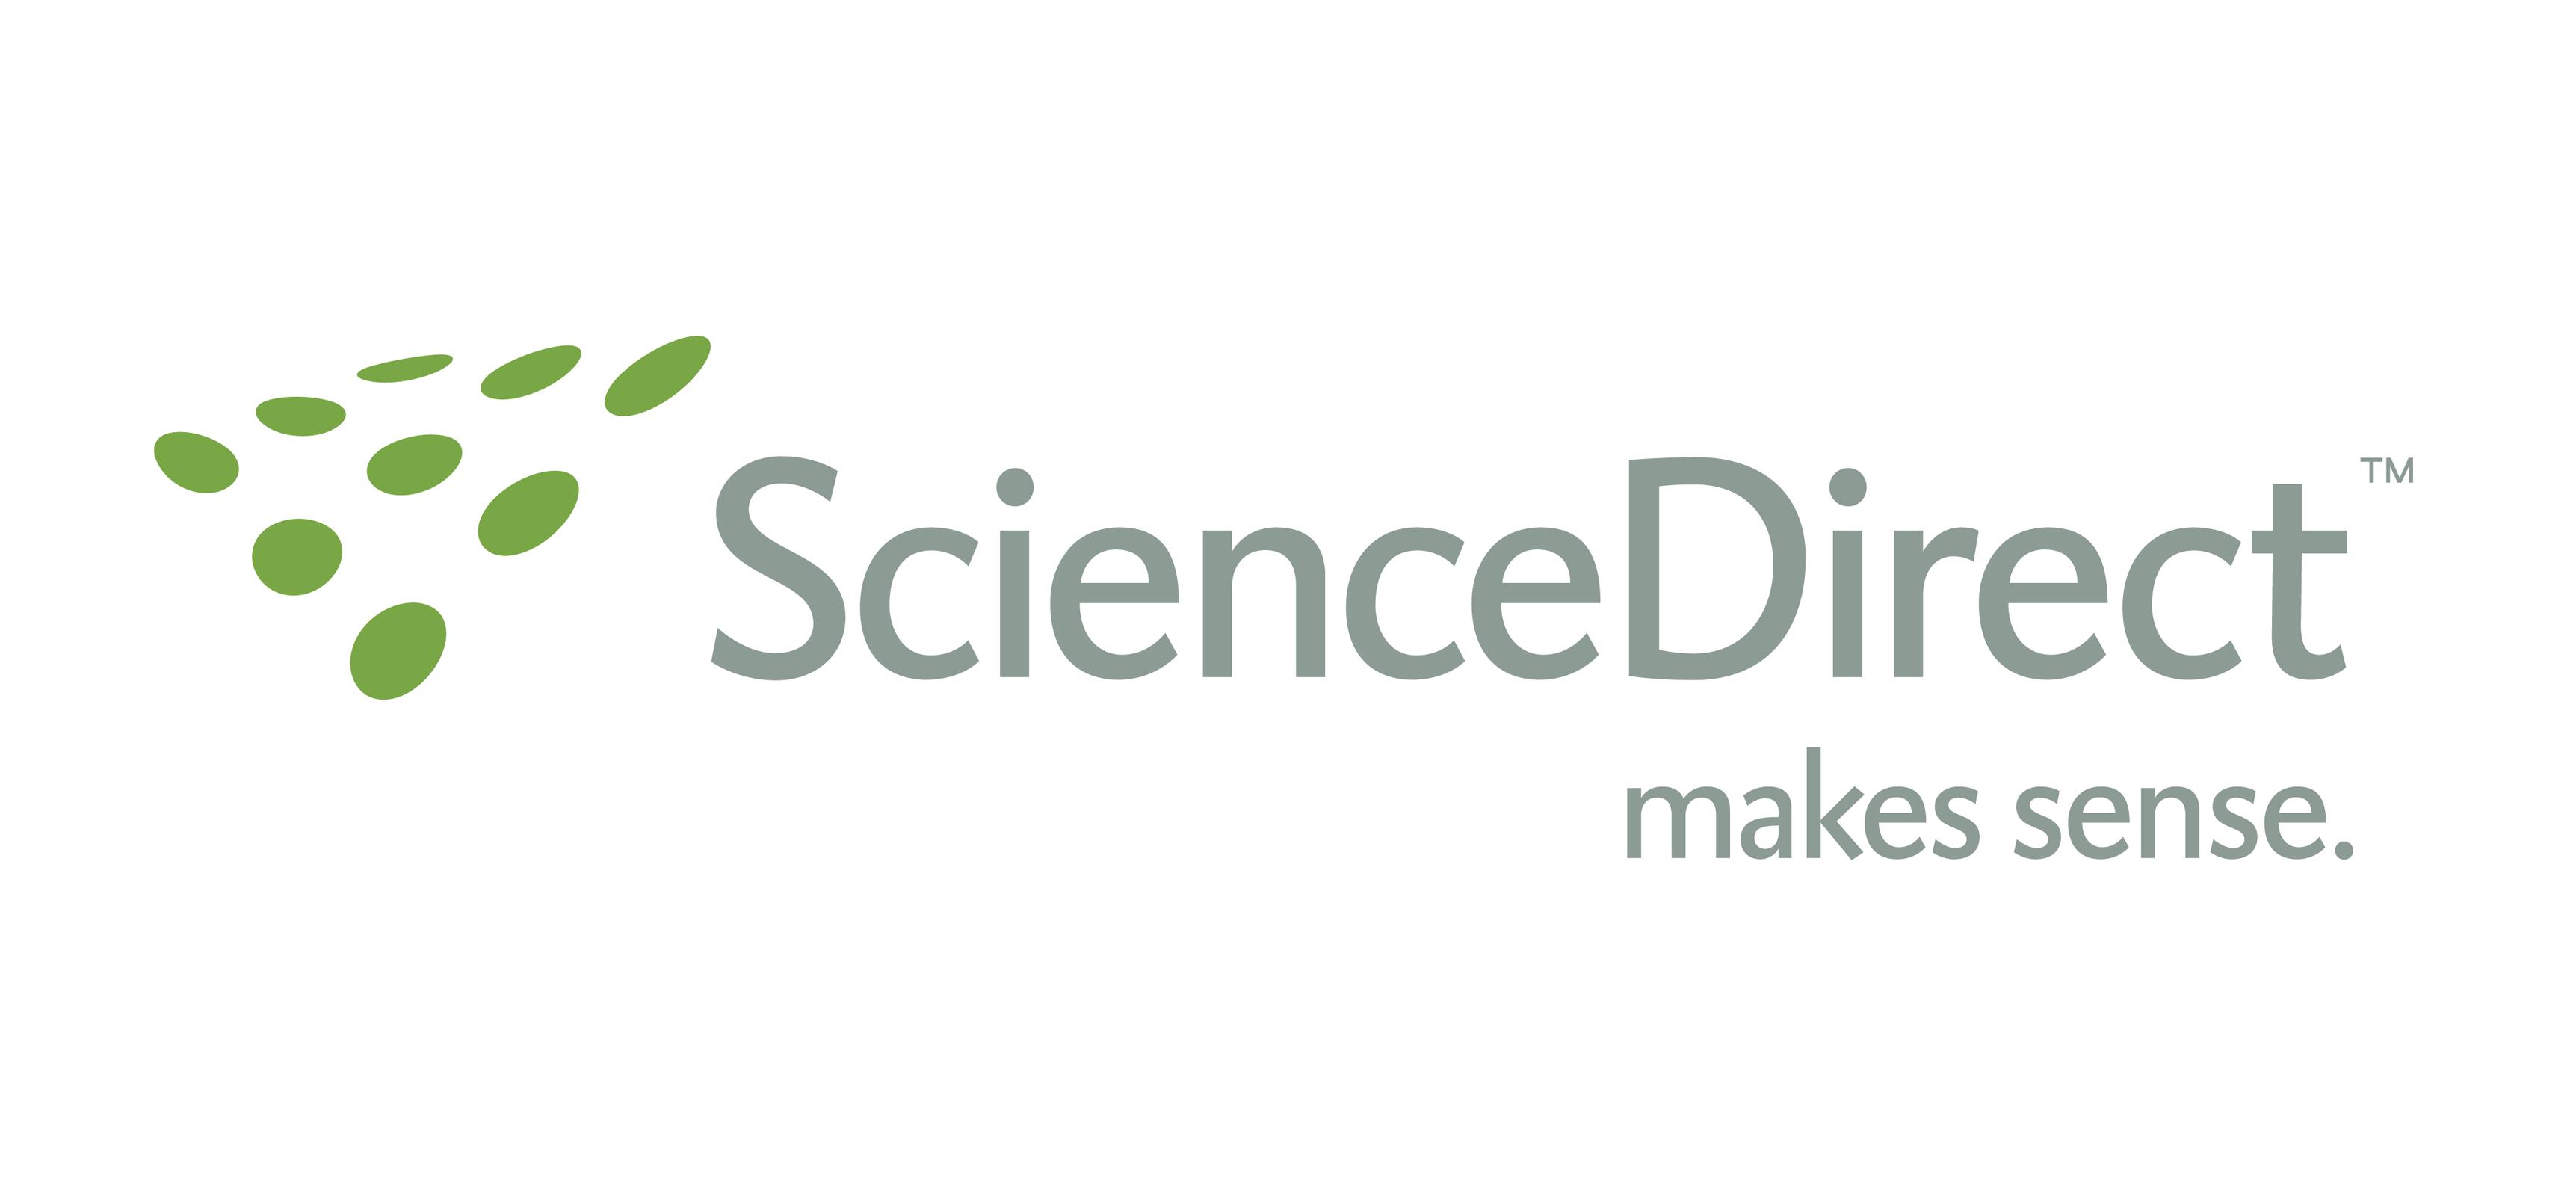 sciencedirect branding guide project